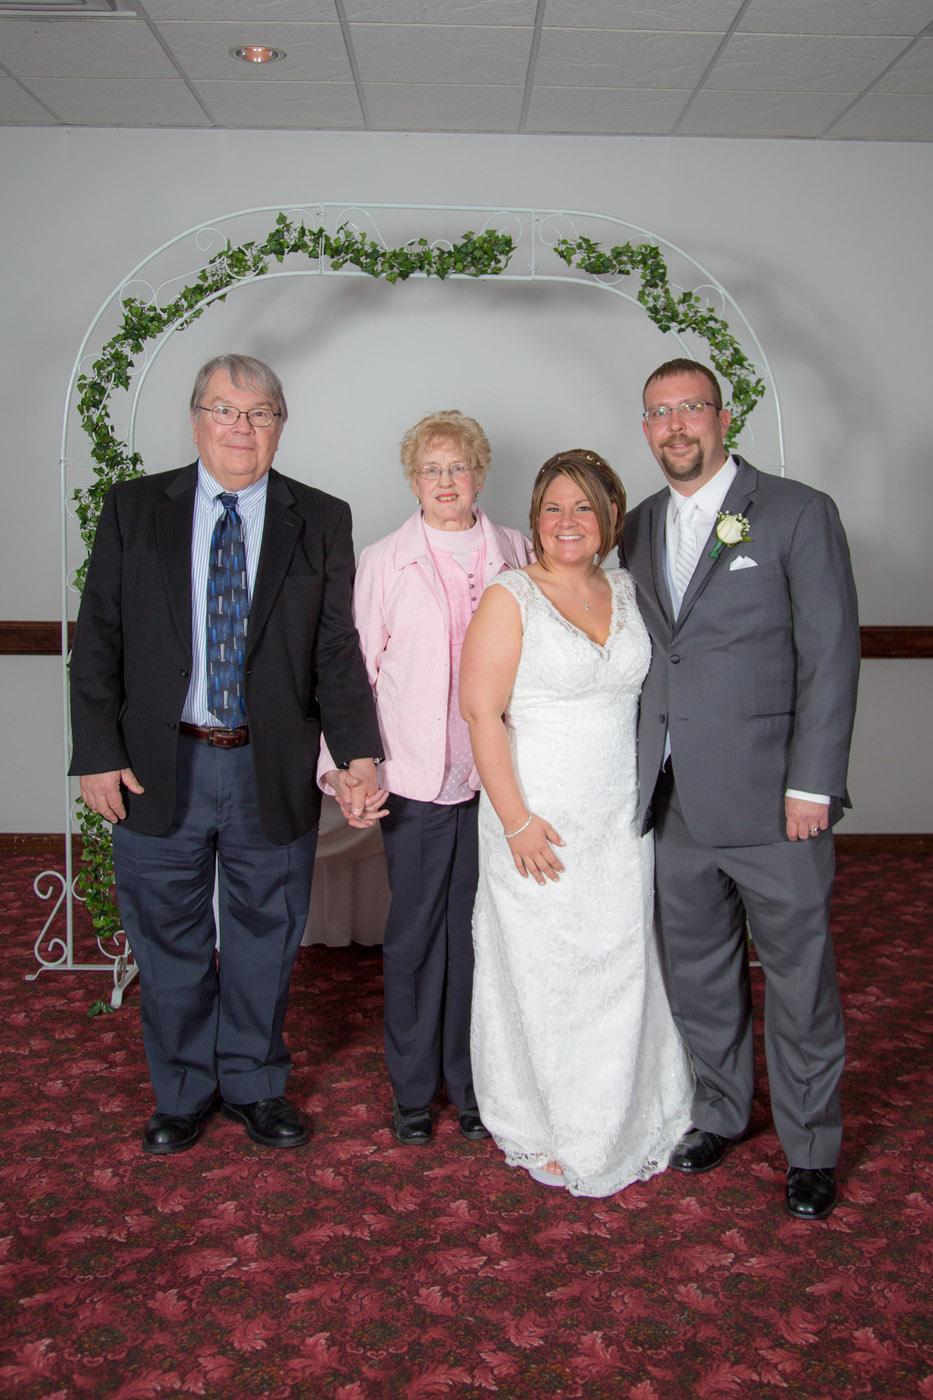 Healy Wedding 1 1422.jpg